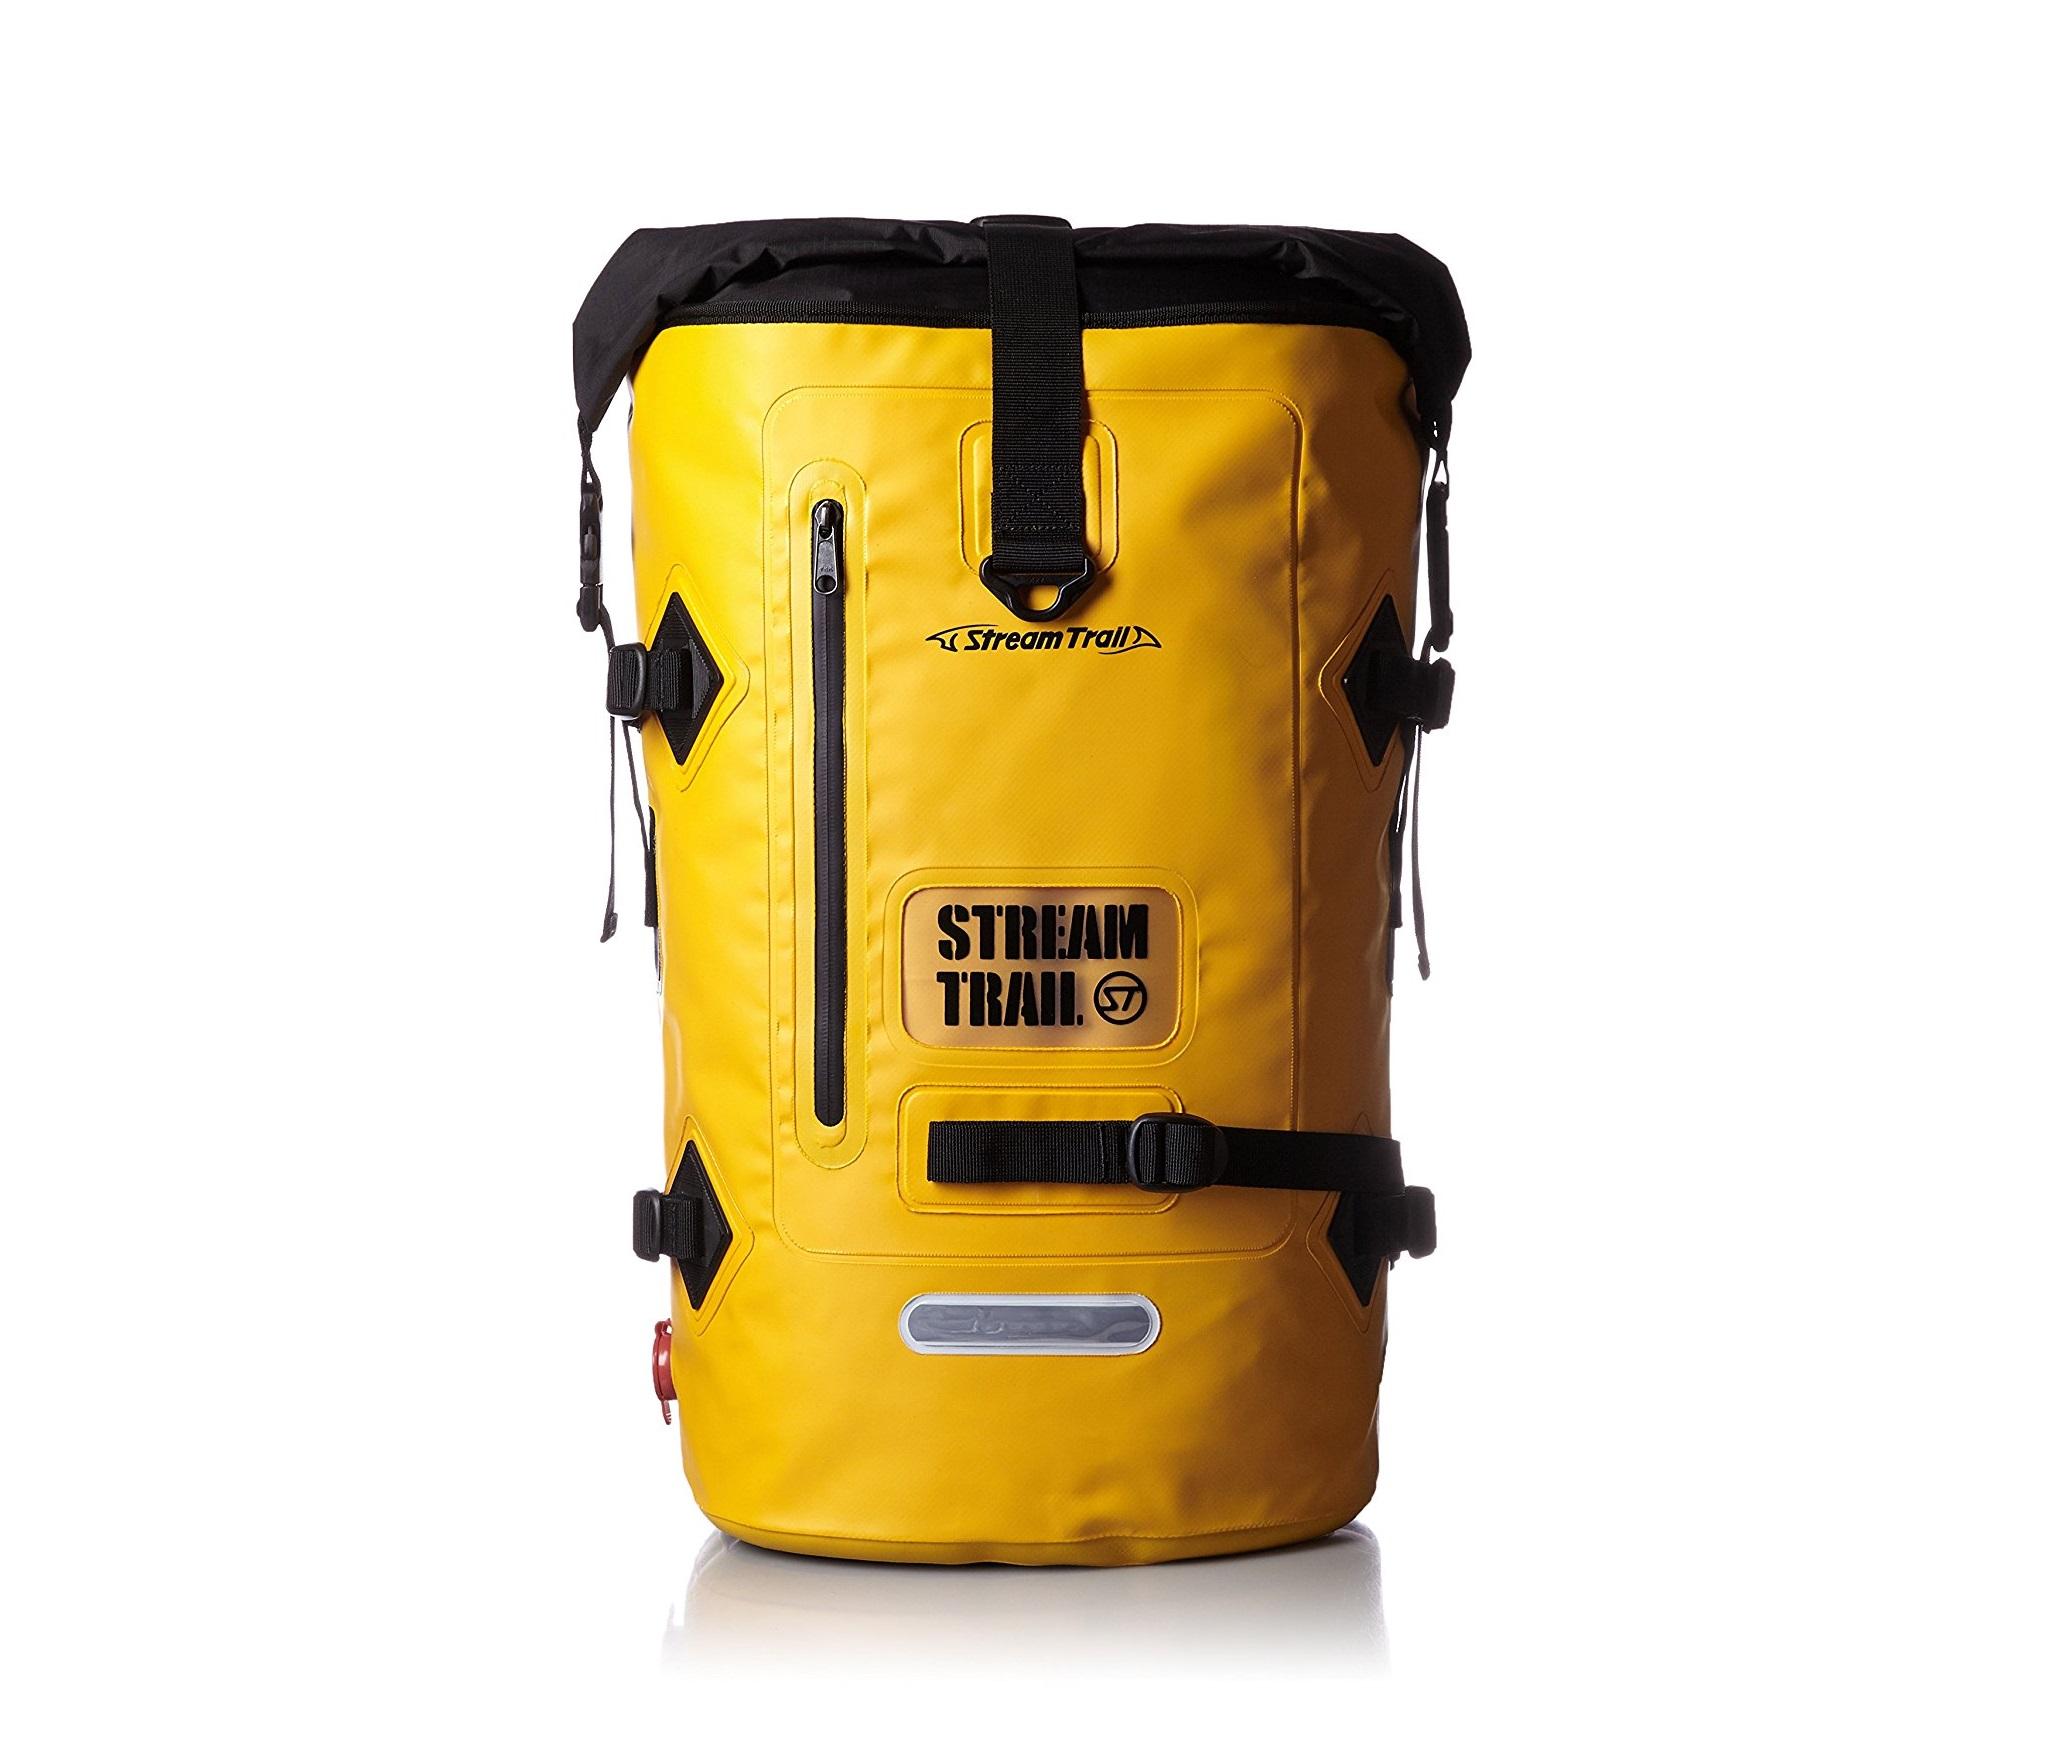 STREAM TRAIL(ストリーム トレイル)のバッグ(黄)の画像